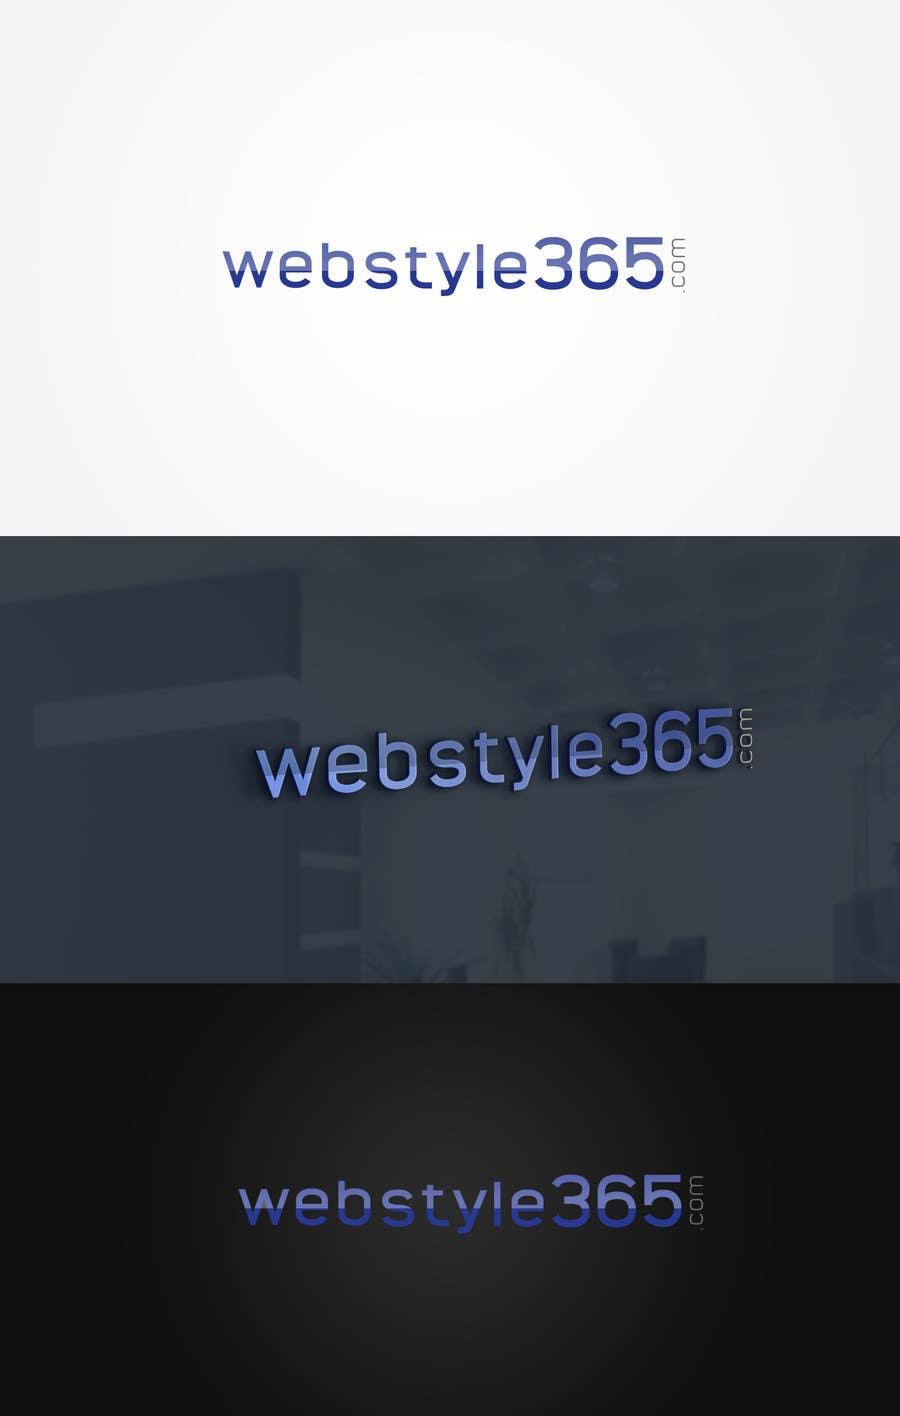 Konkurrenceindlæg #                                        58                                      for                                         Design eines Logos for my Business